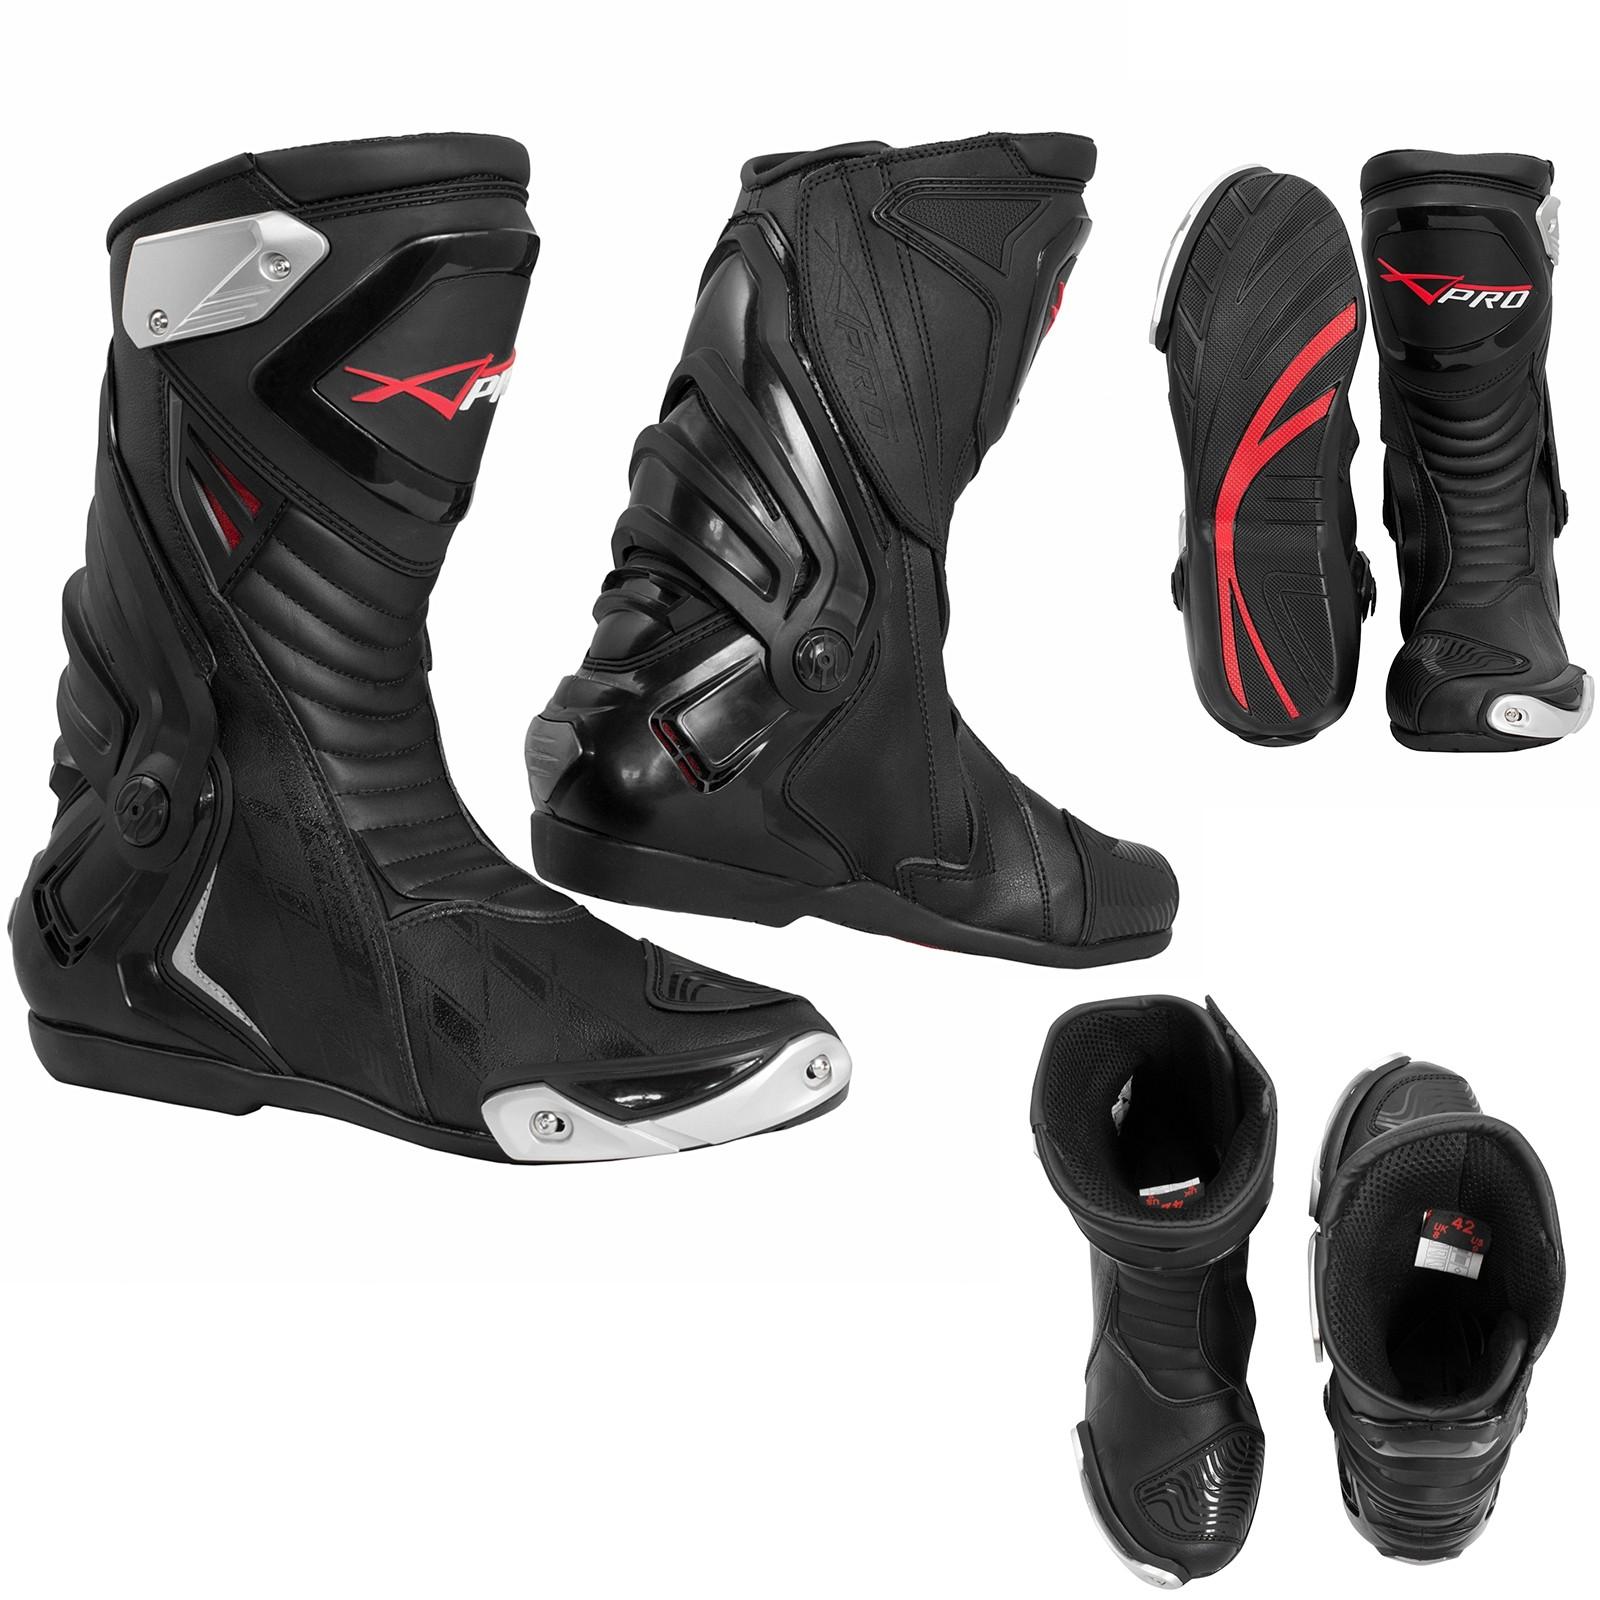 Supertech-Stivali-Boots-Motorcycle-Nero-Black-A-Pro-Sonic-Moto-Set